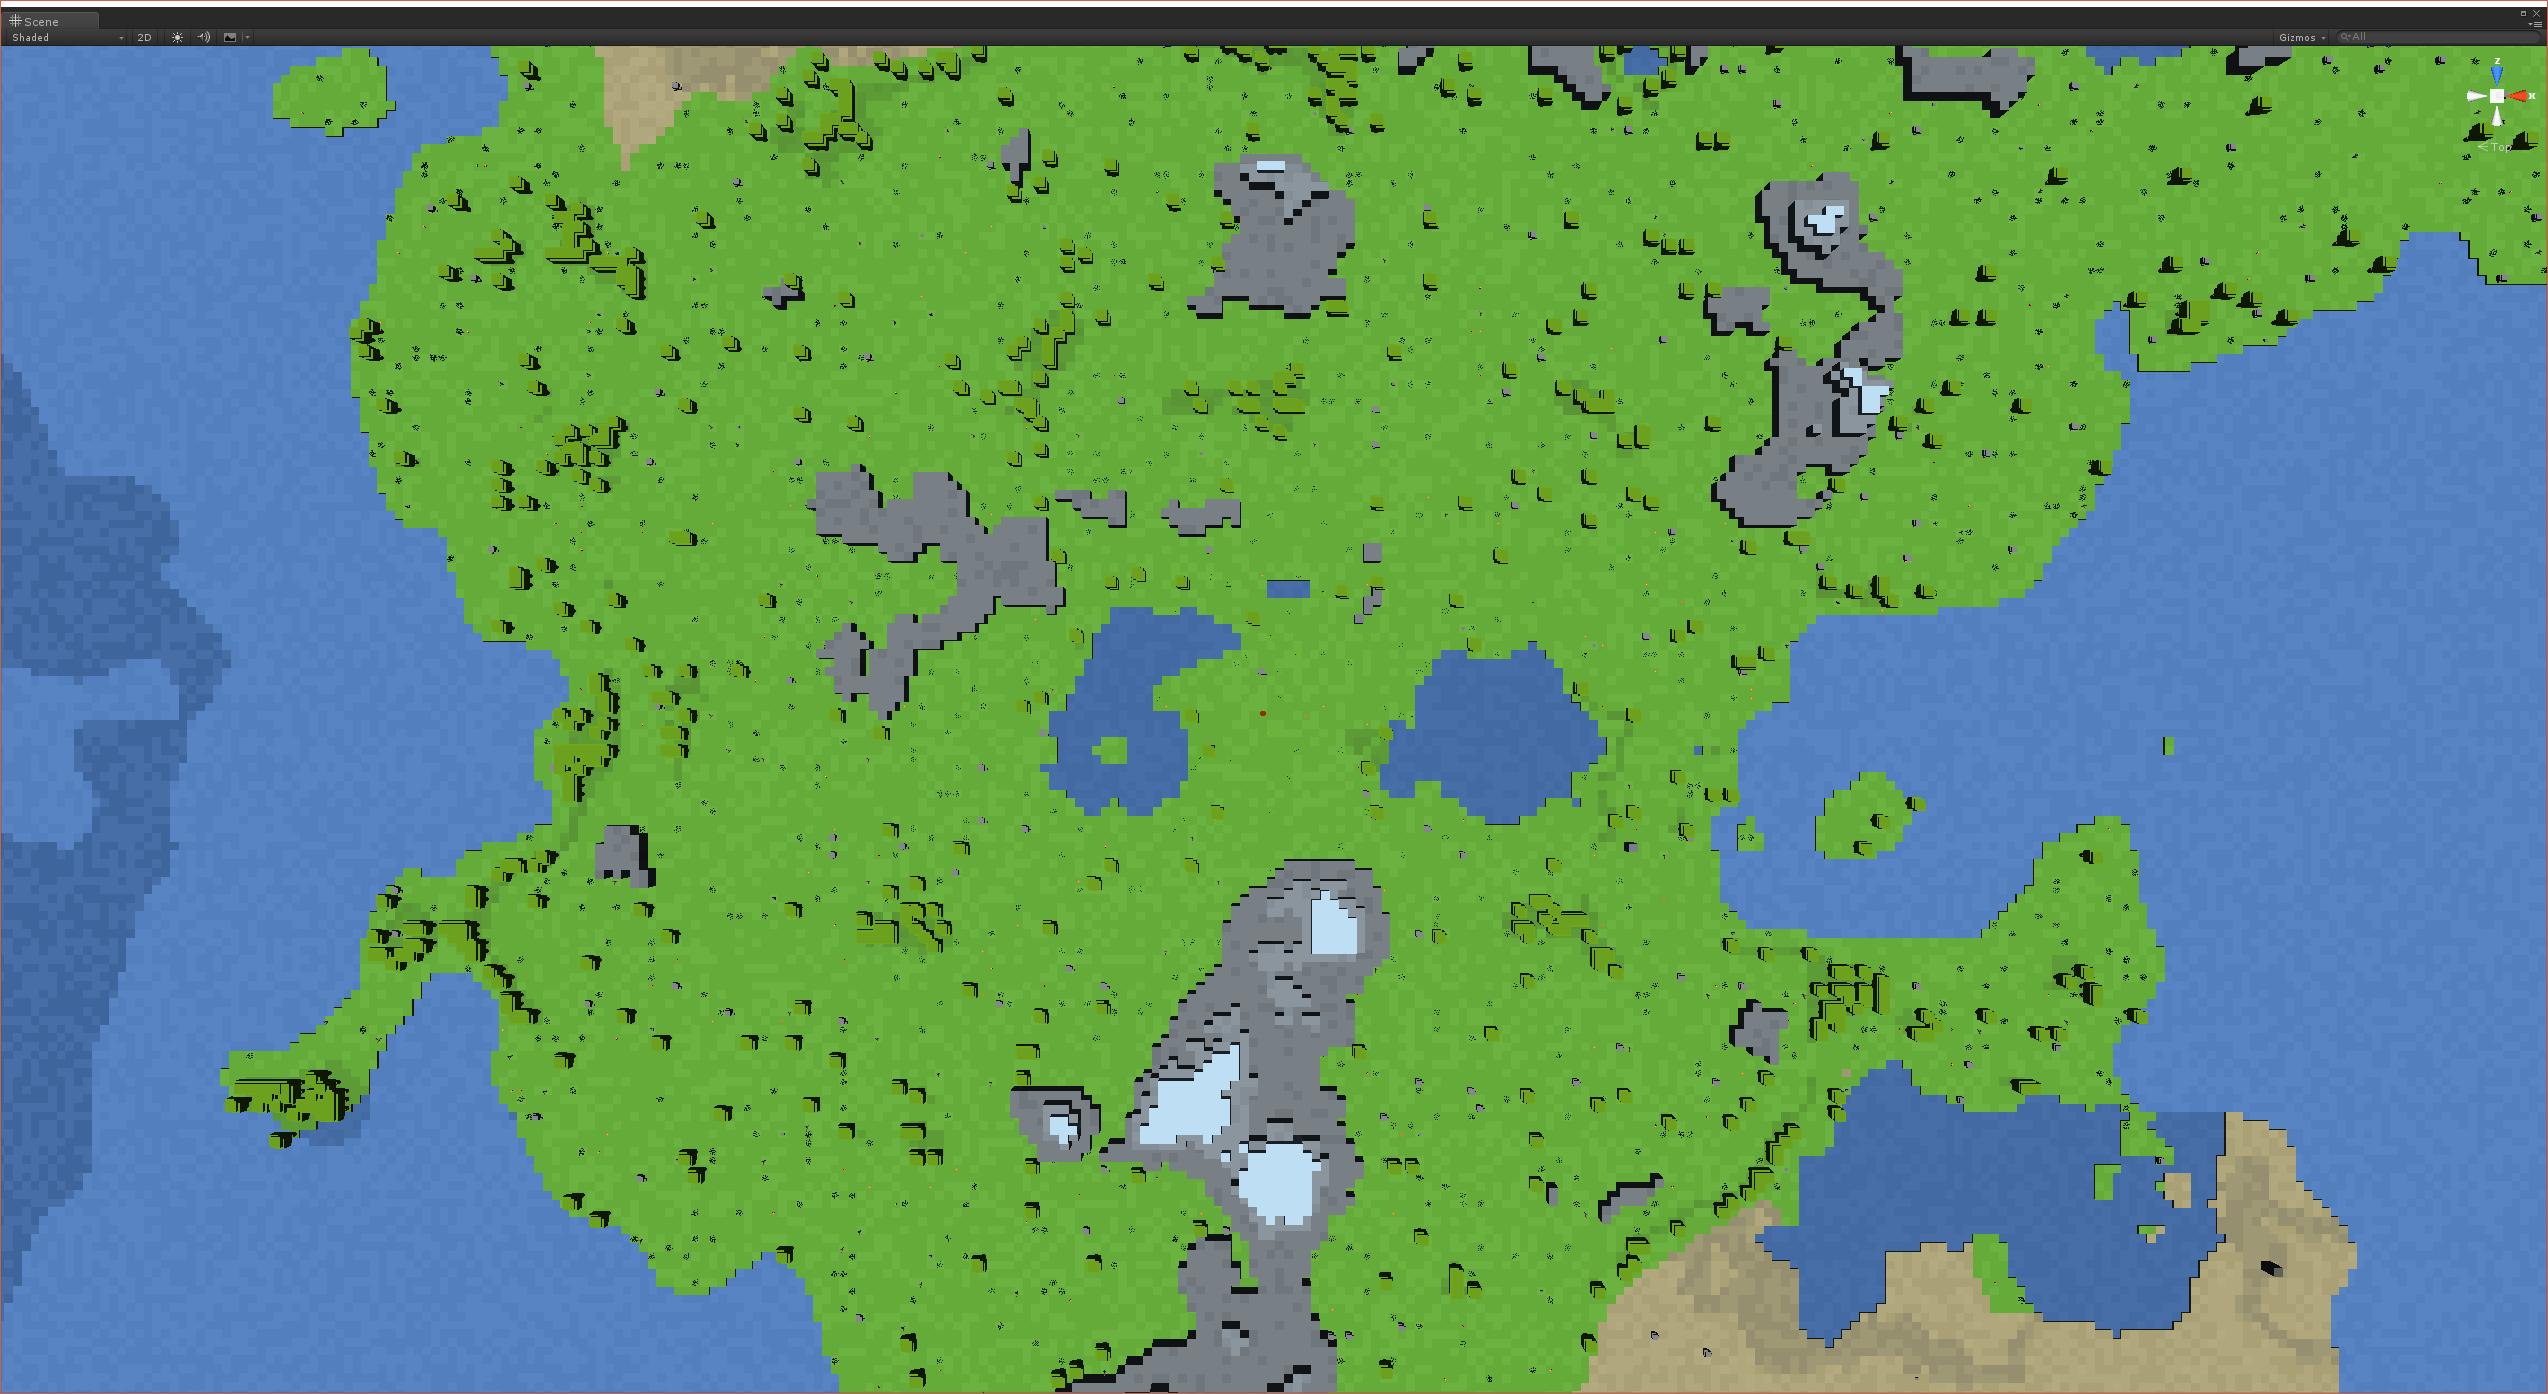 Cubeland (Cancelled)